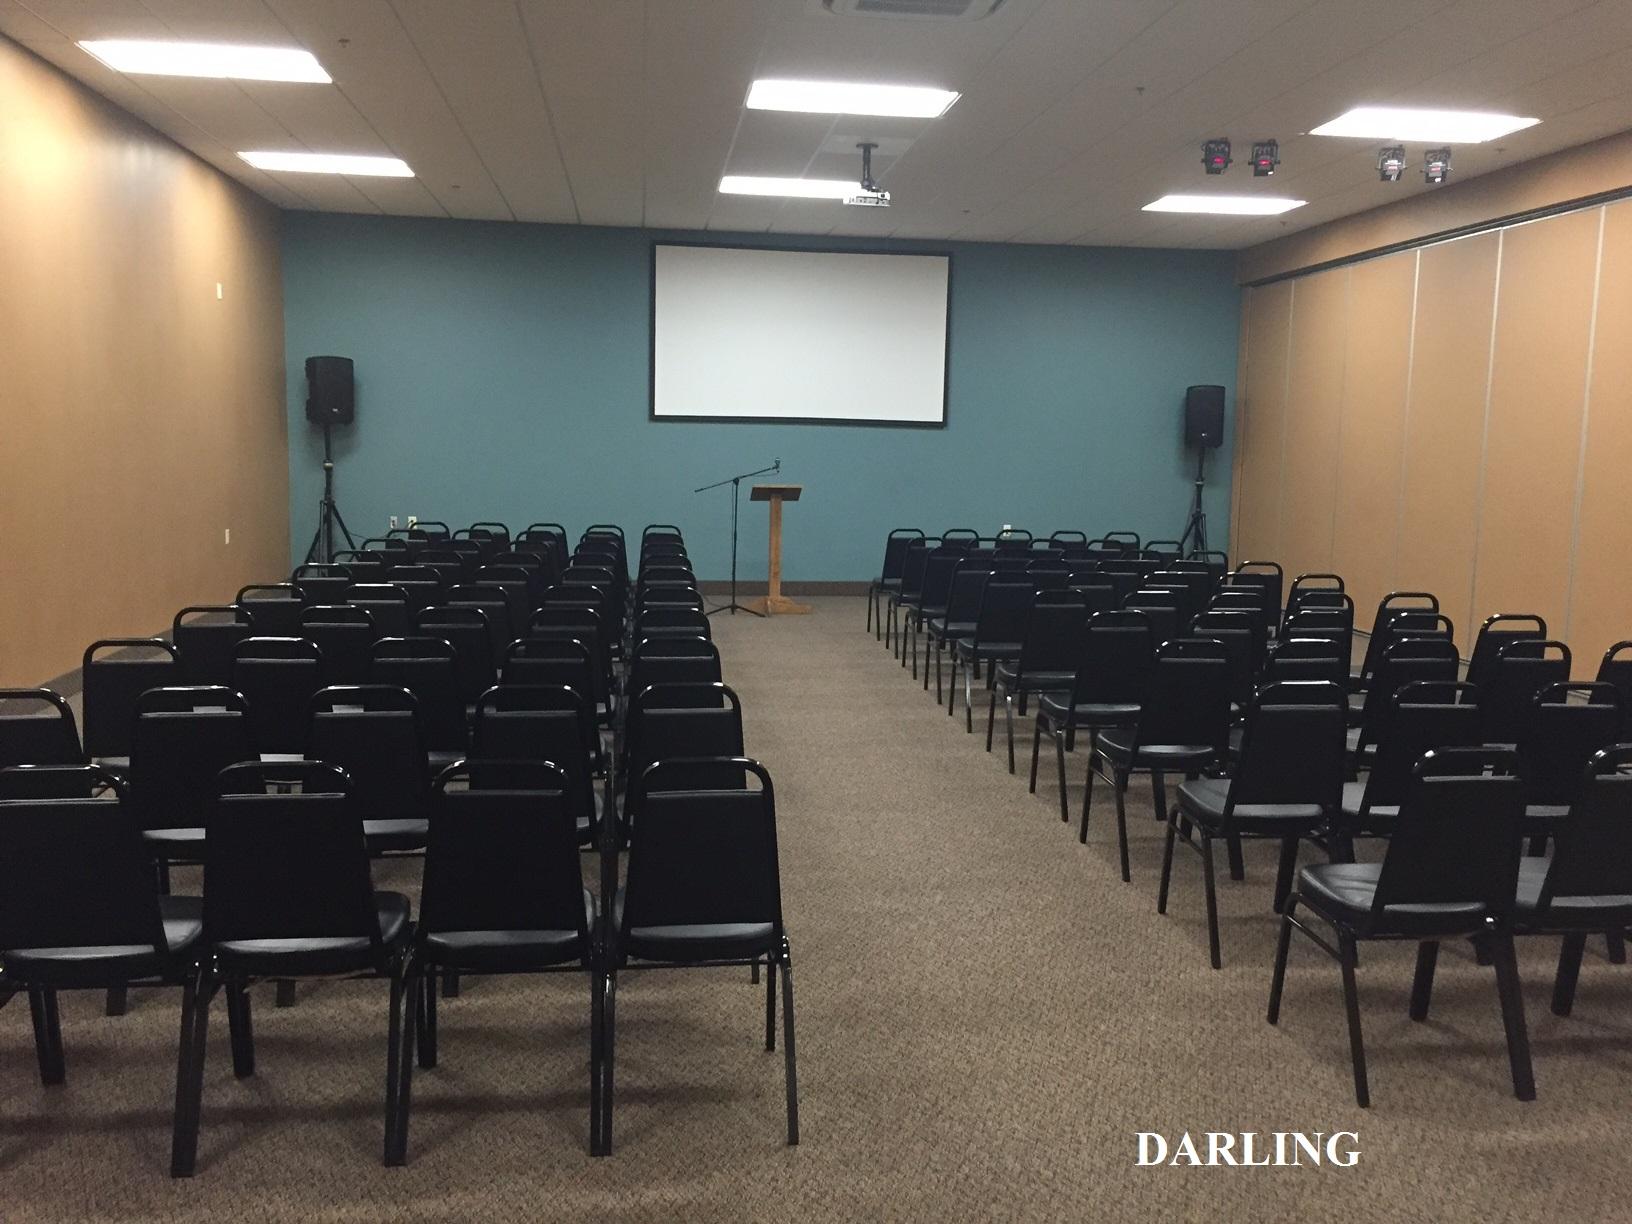 Darling-2